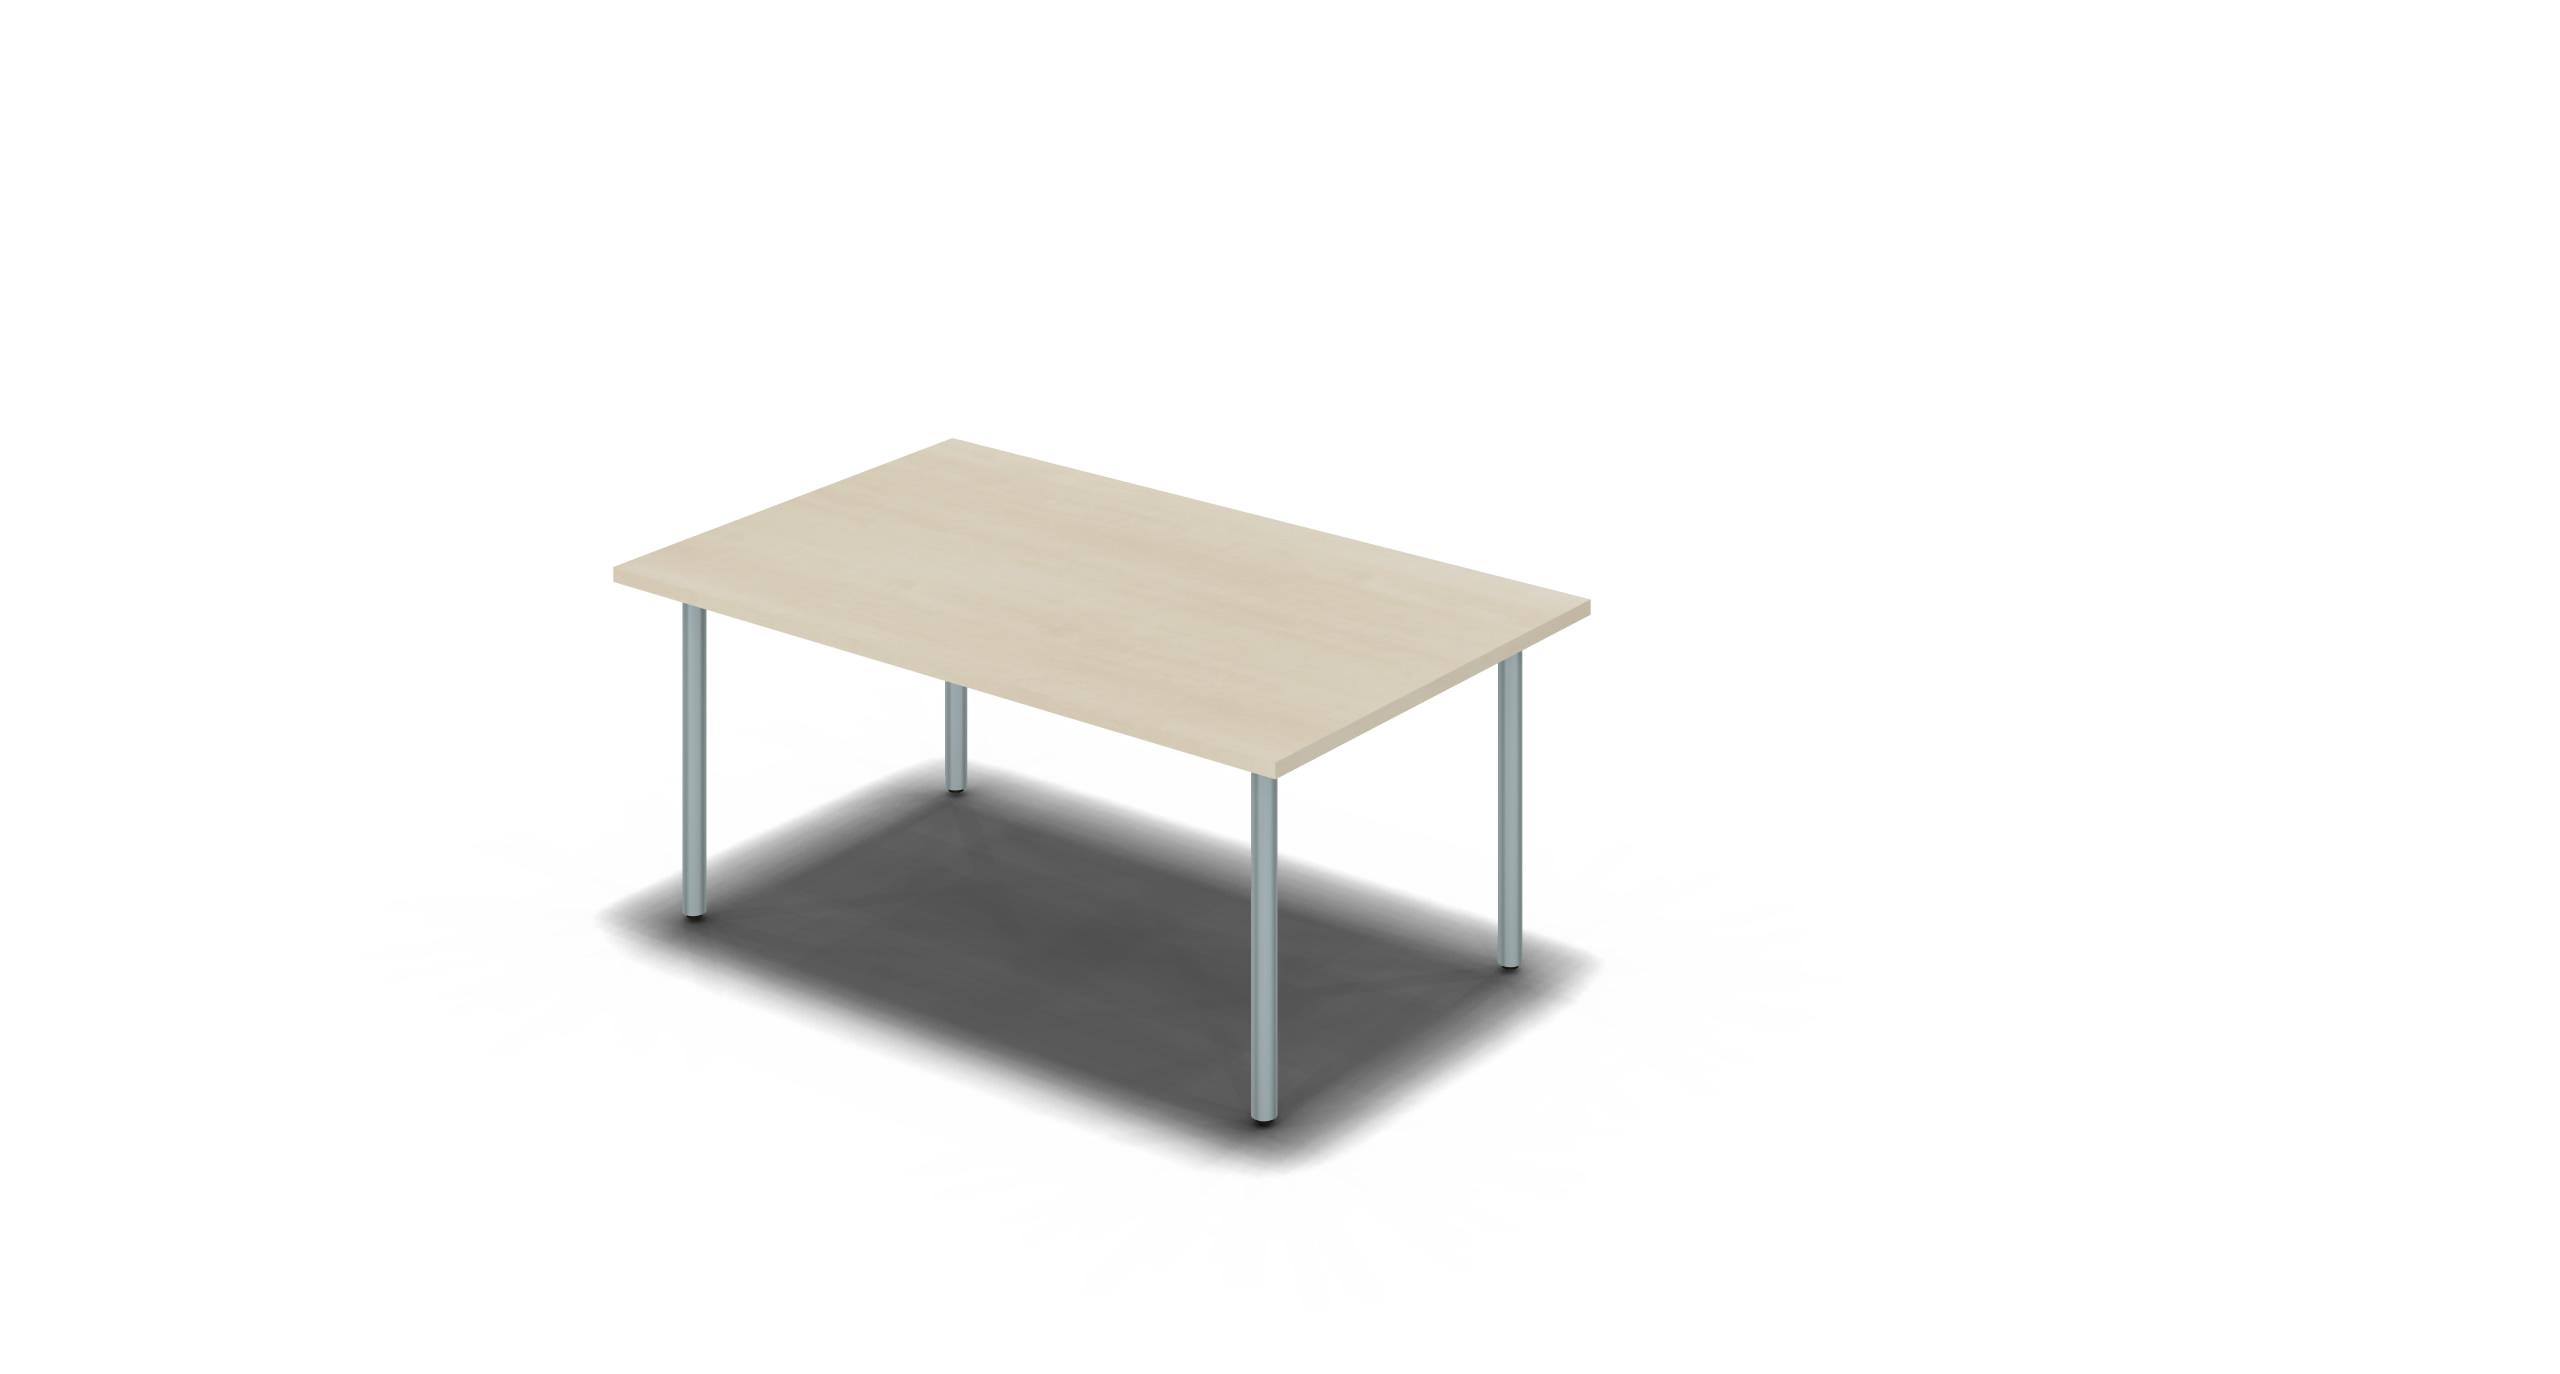 Table_Round_1500x900_Silver_Maple_noOption